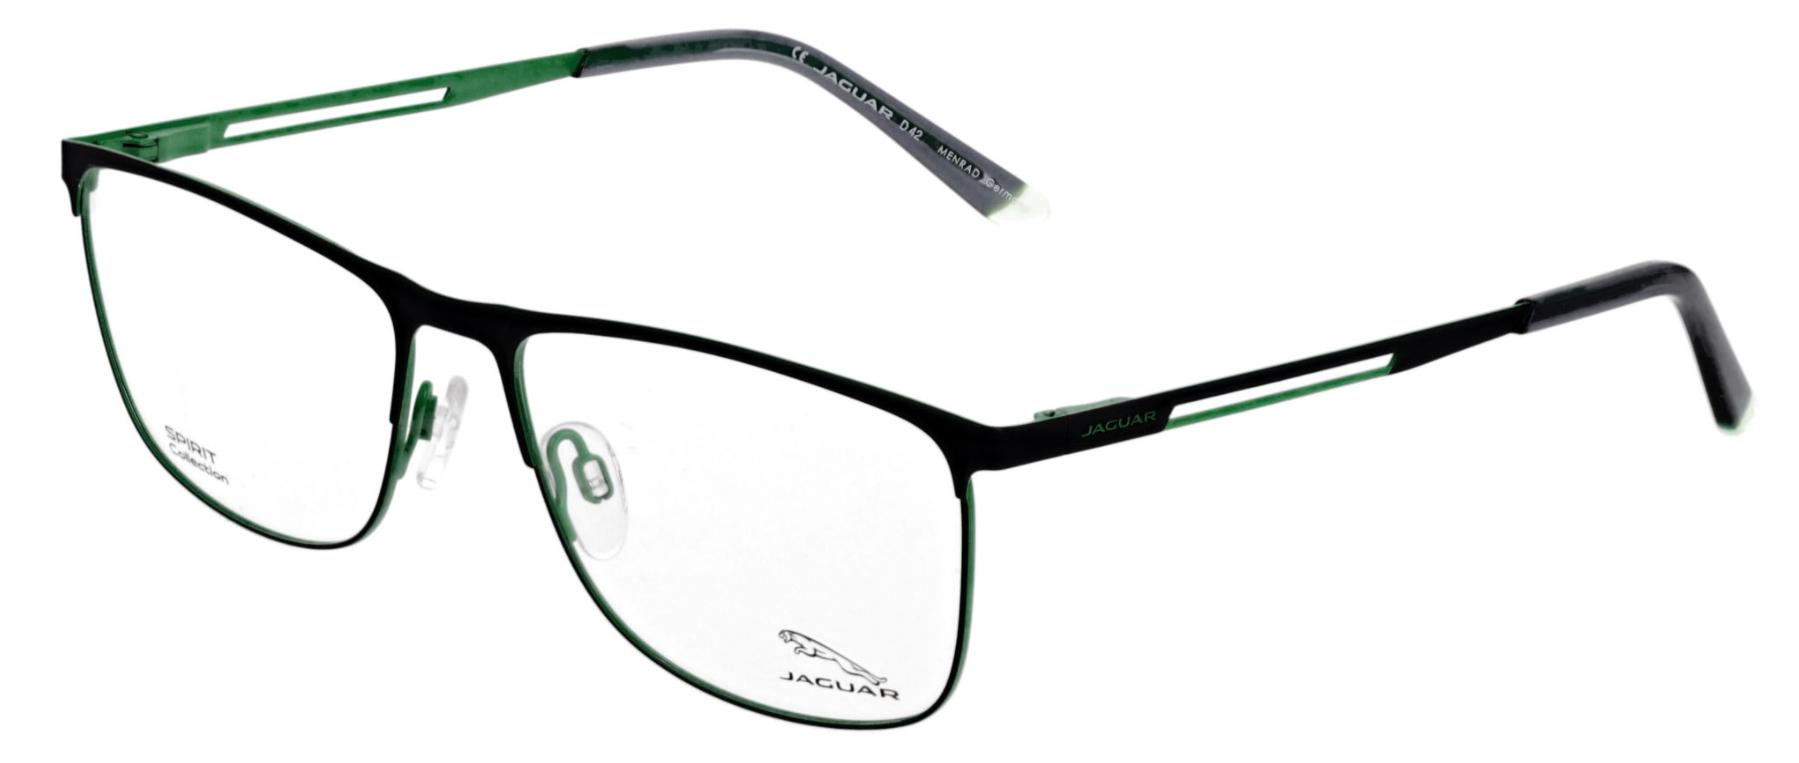 Jaguar Brille 3609 3100